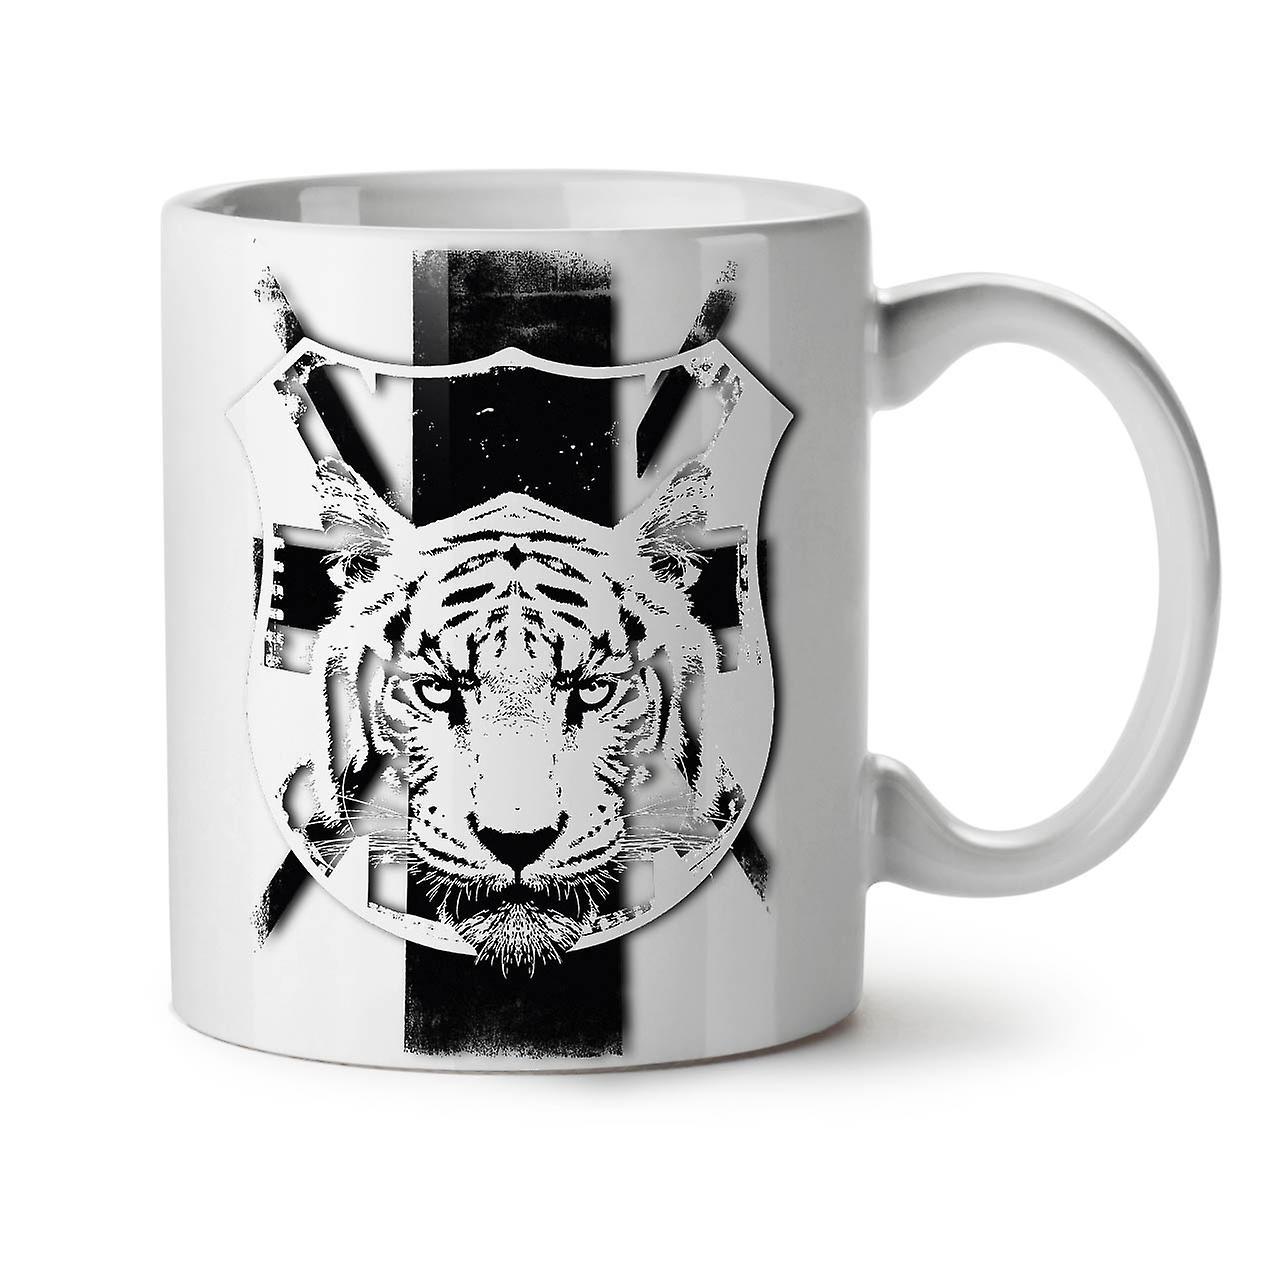 Céramique Tasse Tigre Nouveau Blanc 11 OzWellcoda Café Calme Visage Animal Thé PiXZuOkTwl